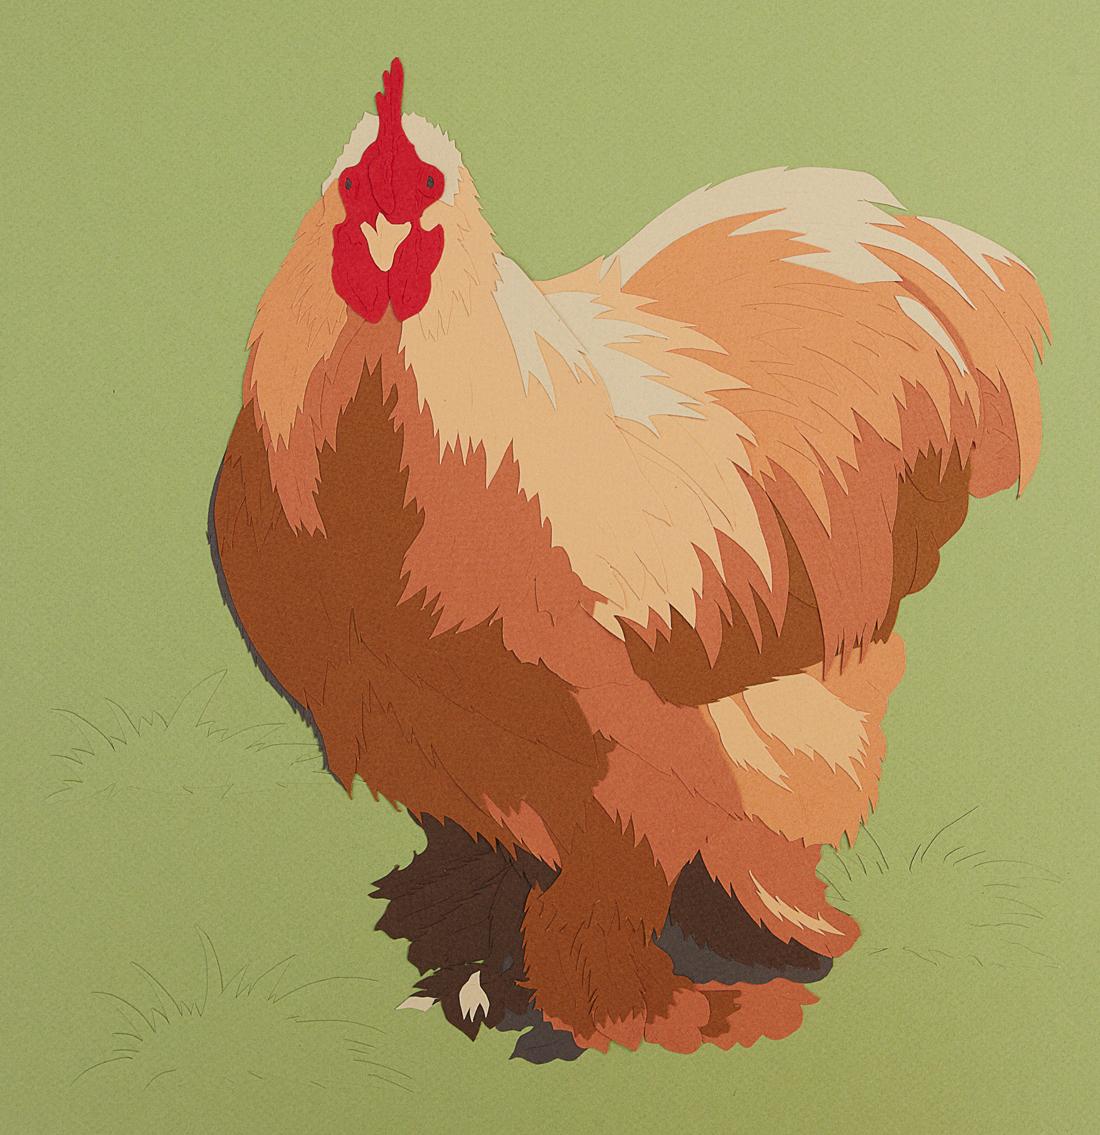 2013_TCP_Resident_Ashley_L_Schick_On_The_Farm_Series_879.jpg